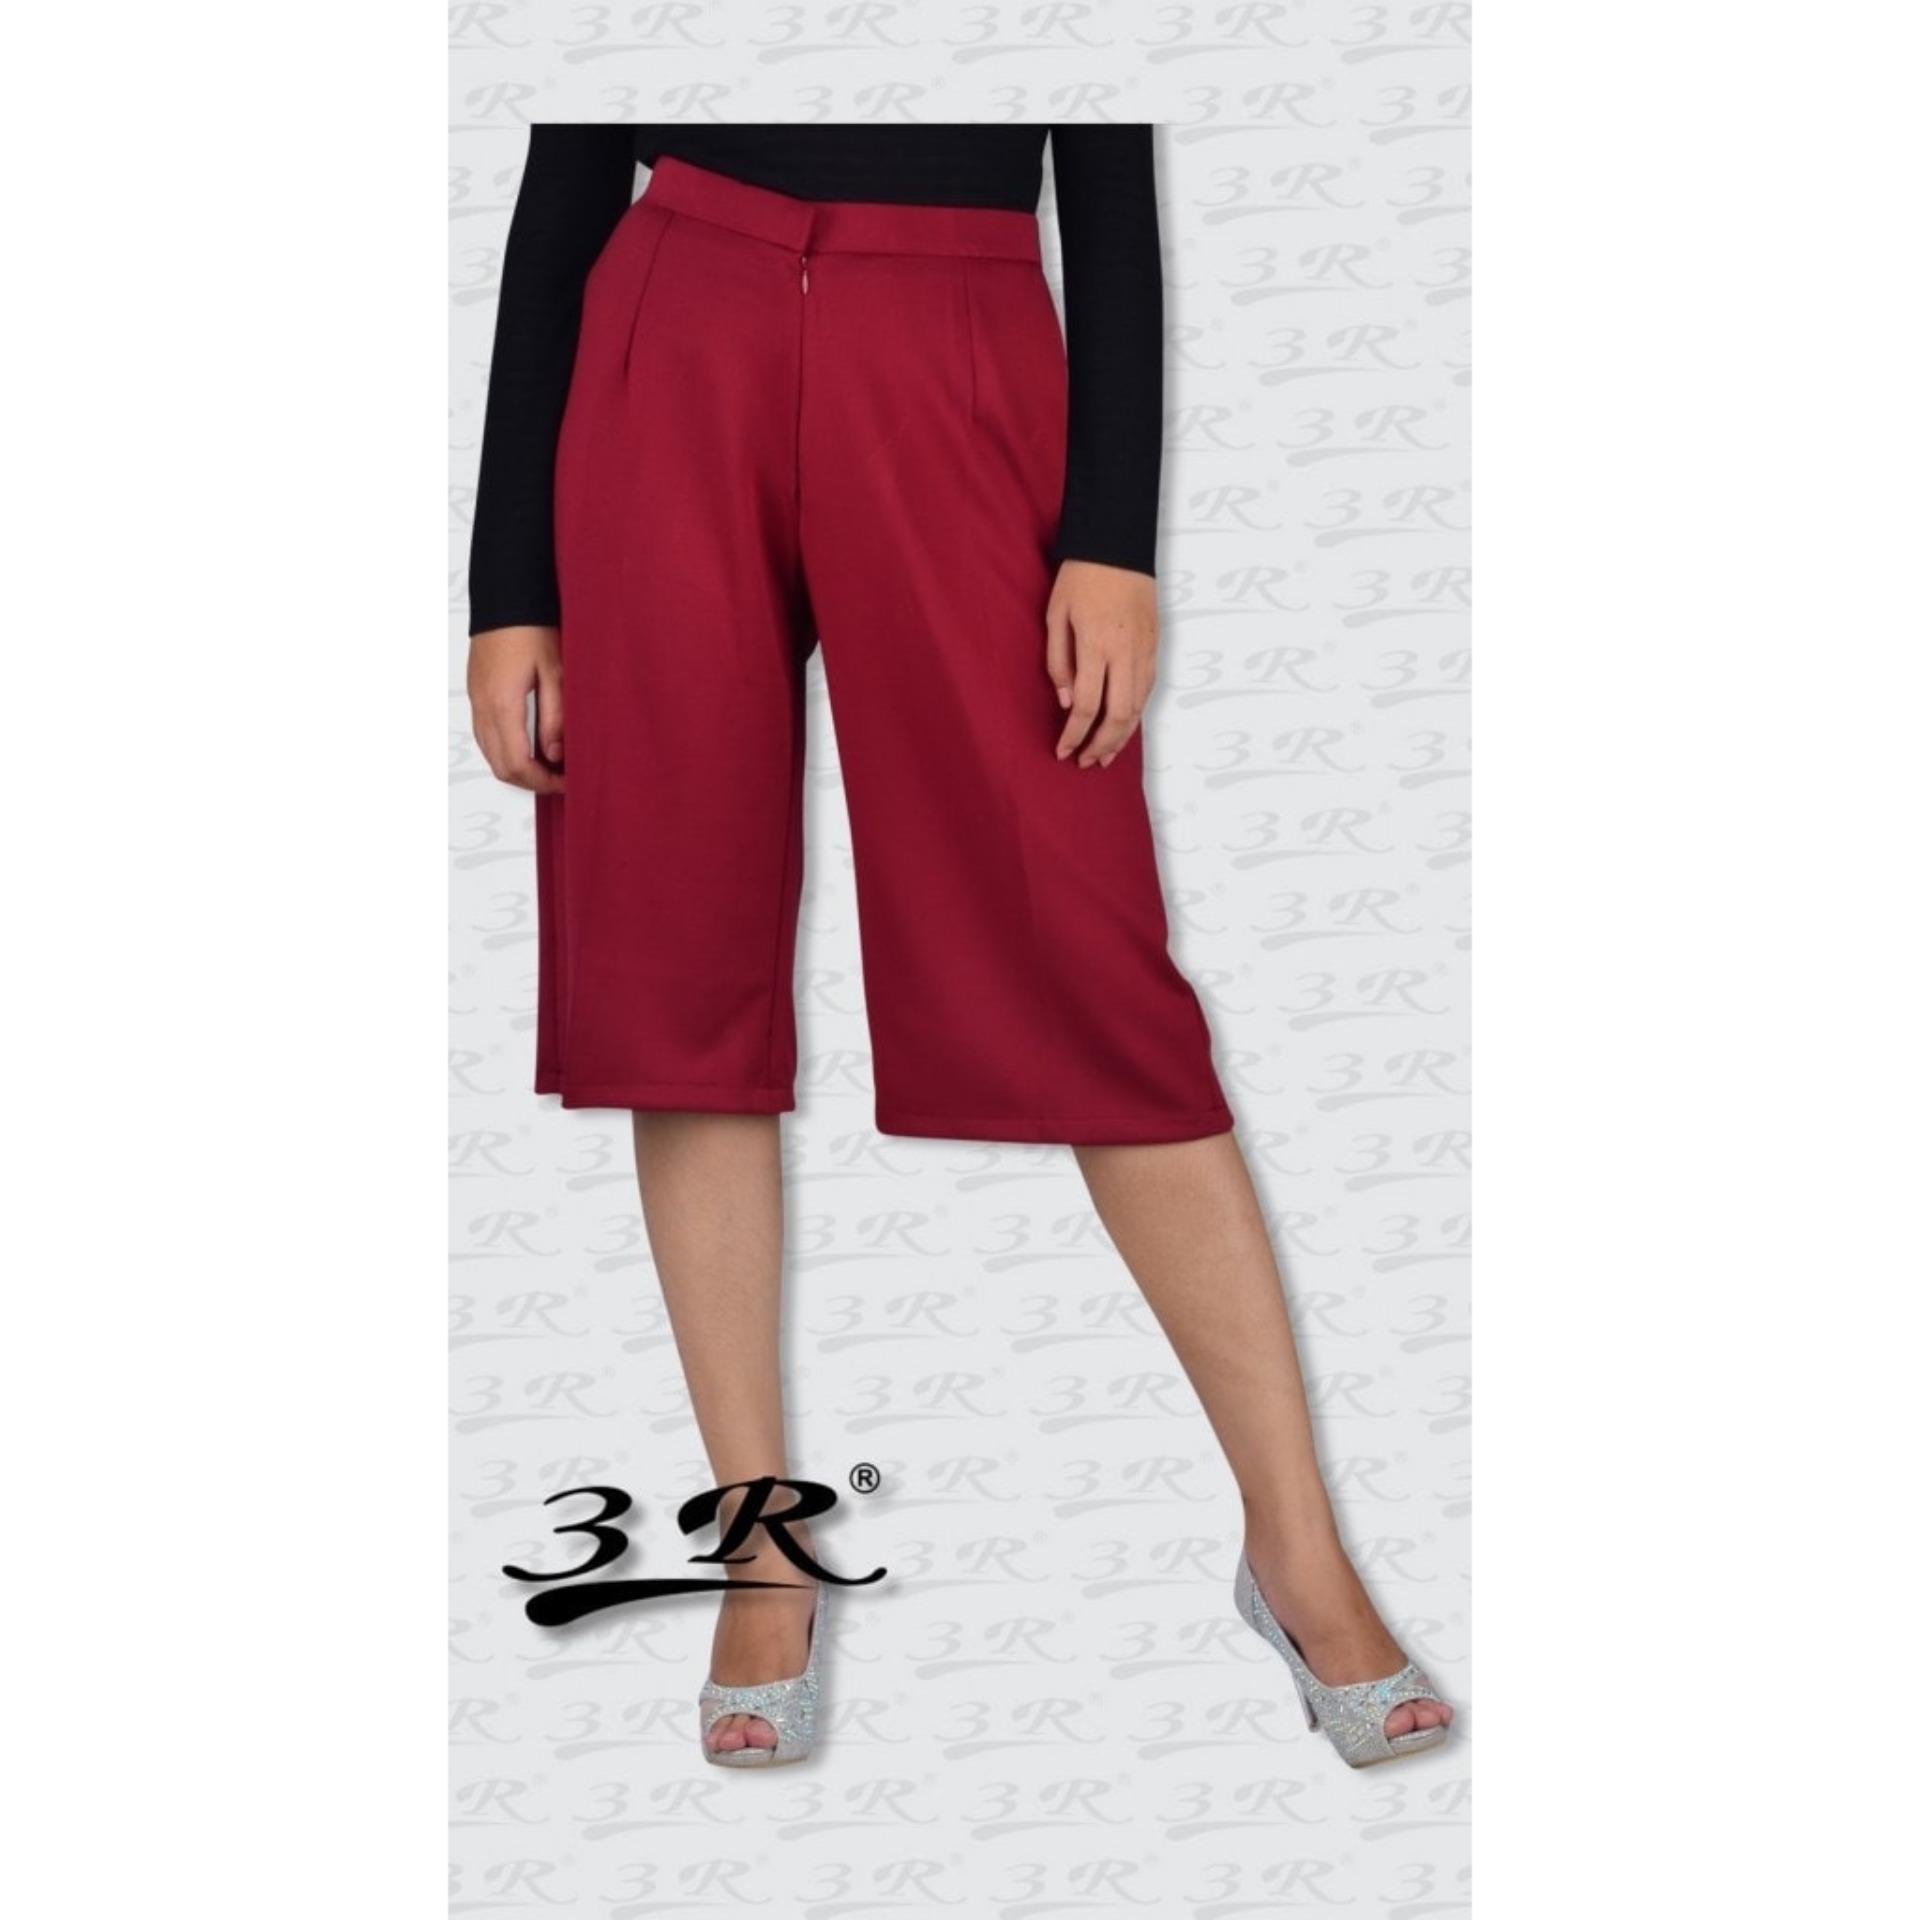 Pencarian Termurah Ayako Fashion Cullote Long Pants Pixie Celana Source · Kulot Pendek Celana Wanita Scuba